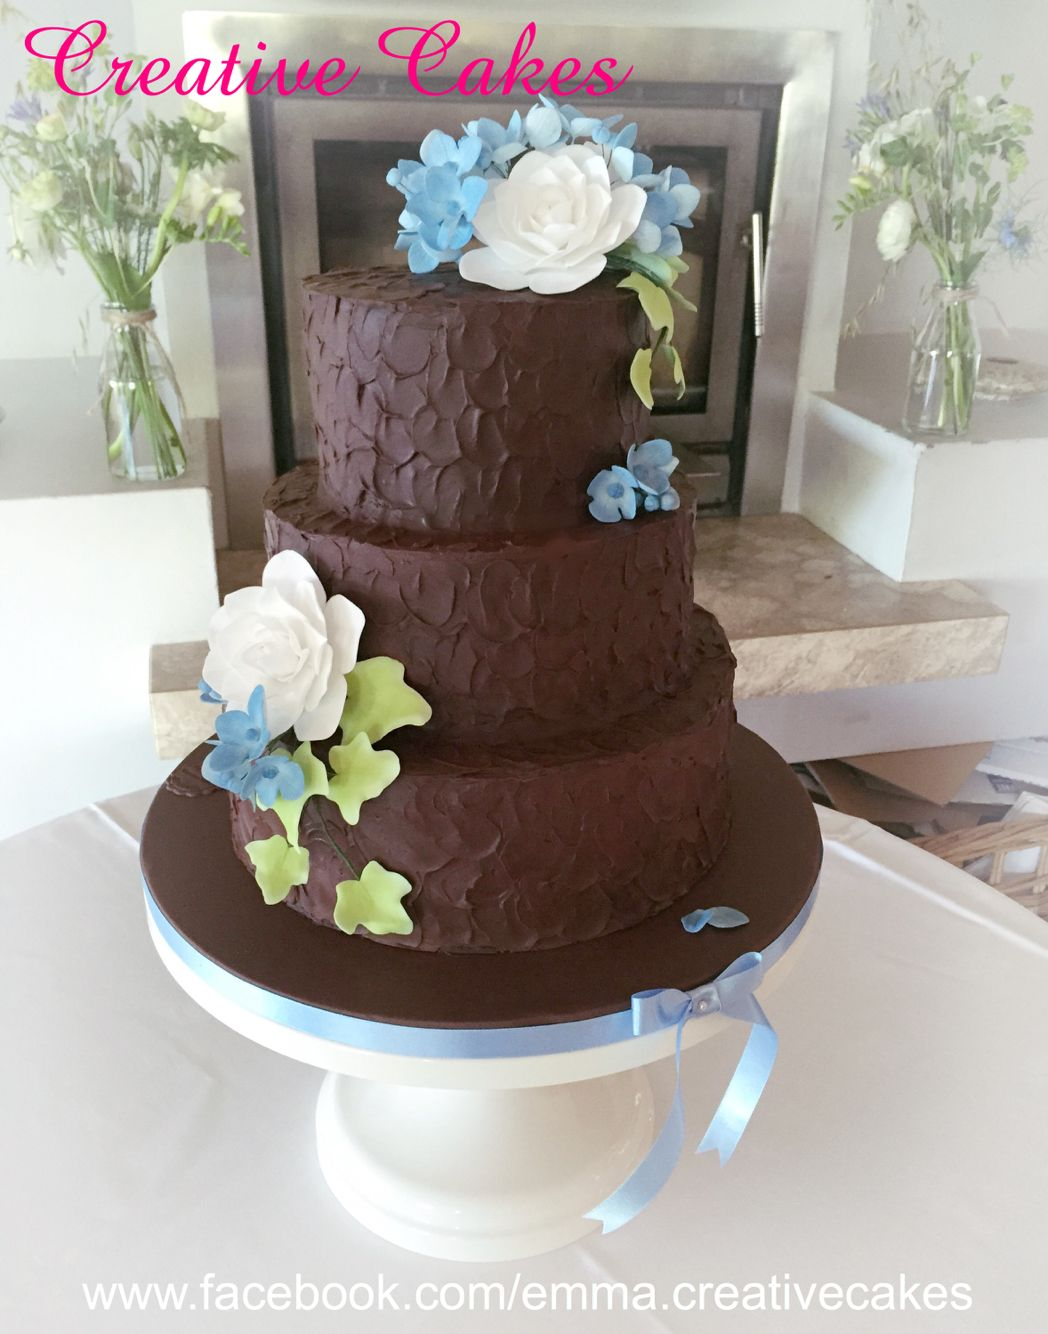 Rustic chocolate wedding cake made with chocolate ganache and